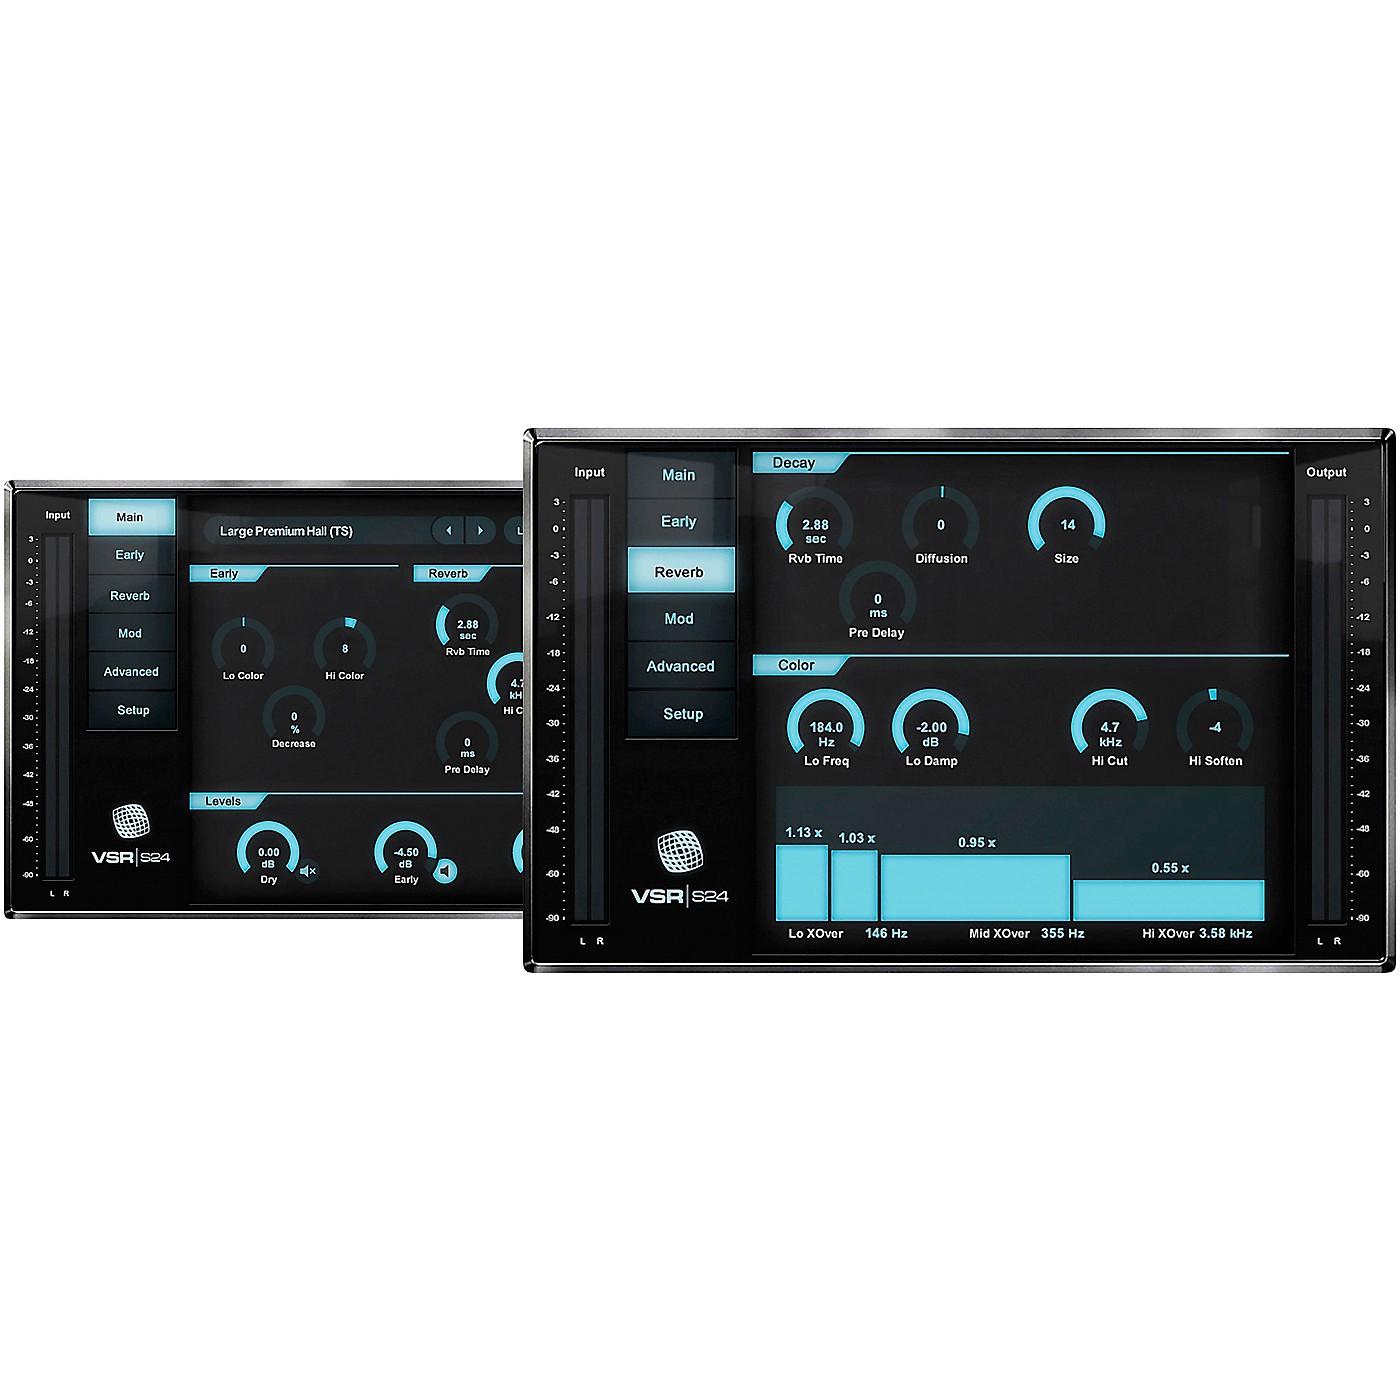 RELAB VSR S24 Reverb (Software Download) thumbnail